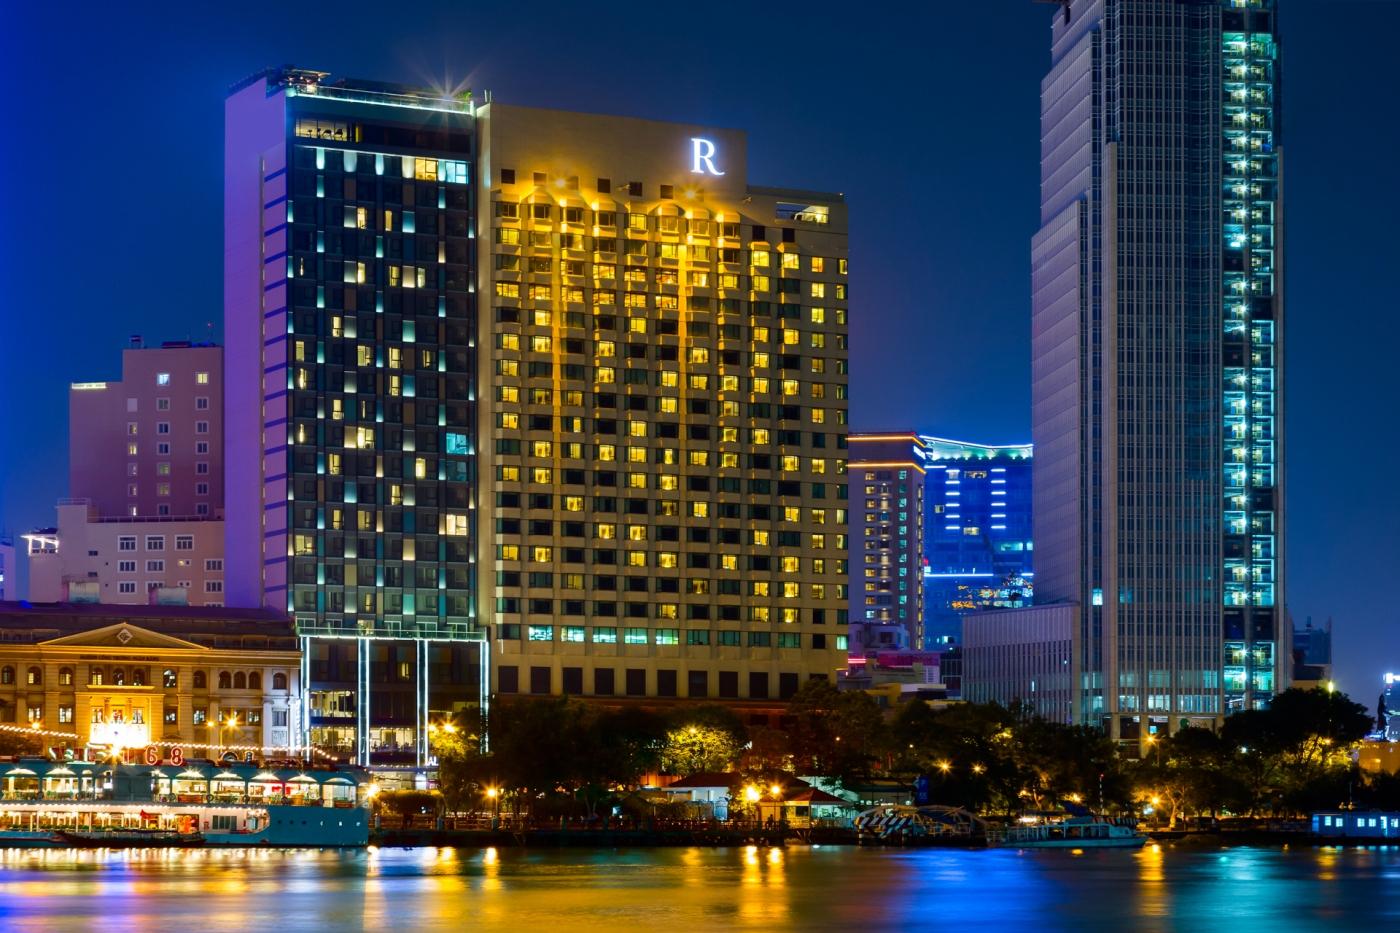 Renaissance Riverside Hotel Saigon. Fotos: Cortesía Marriot International